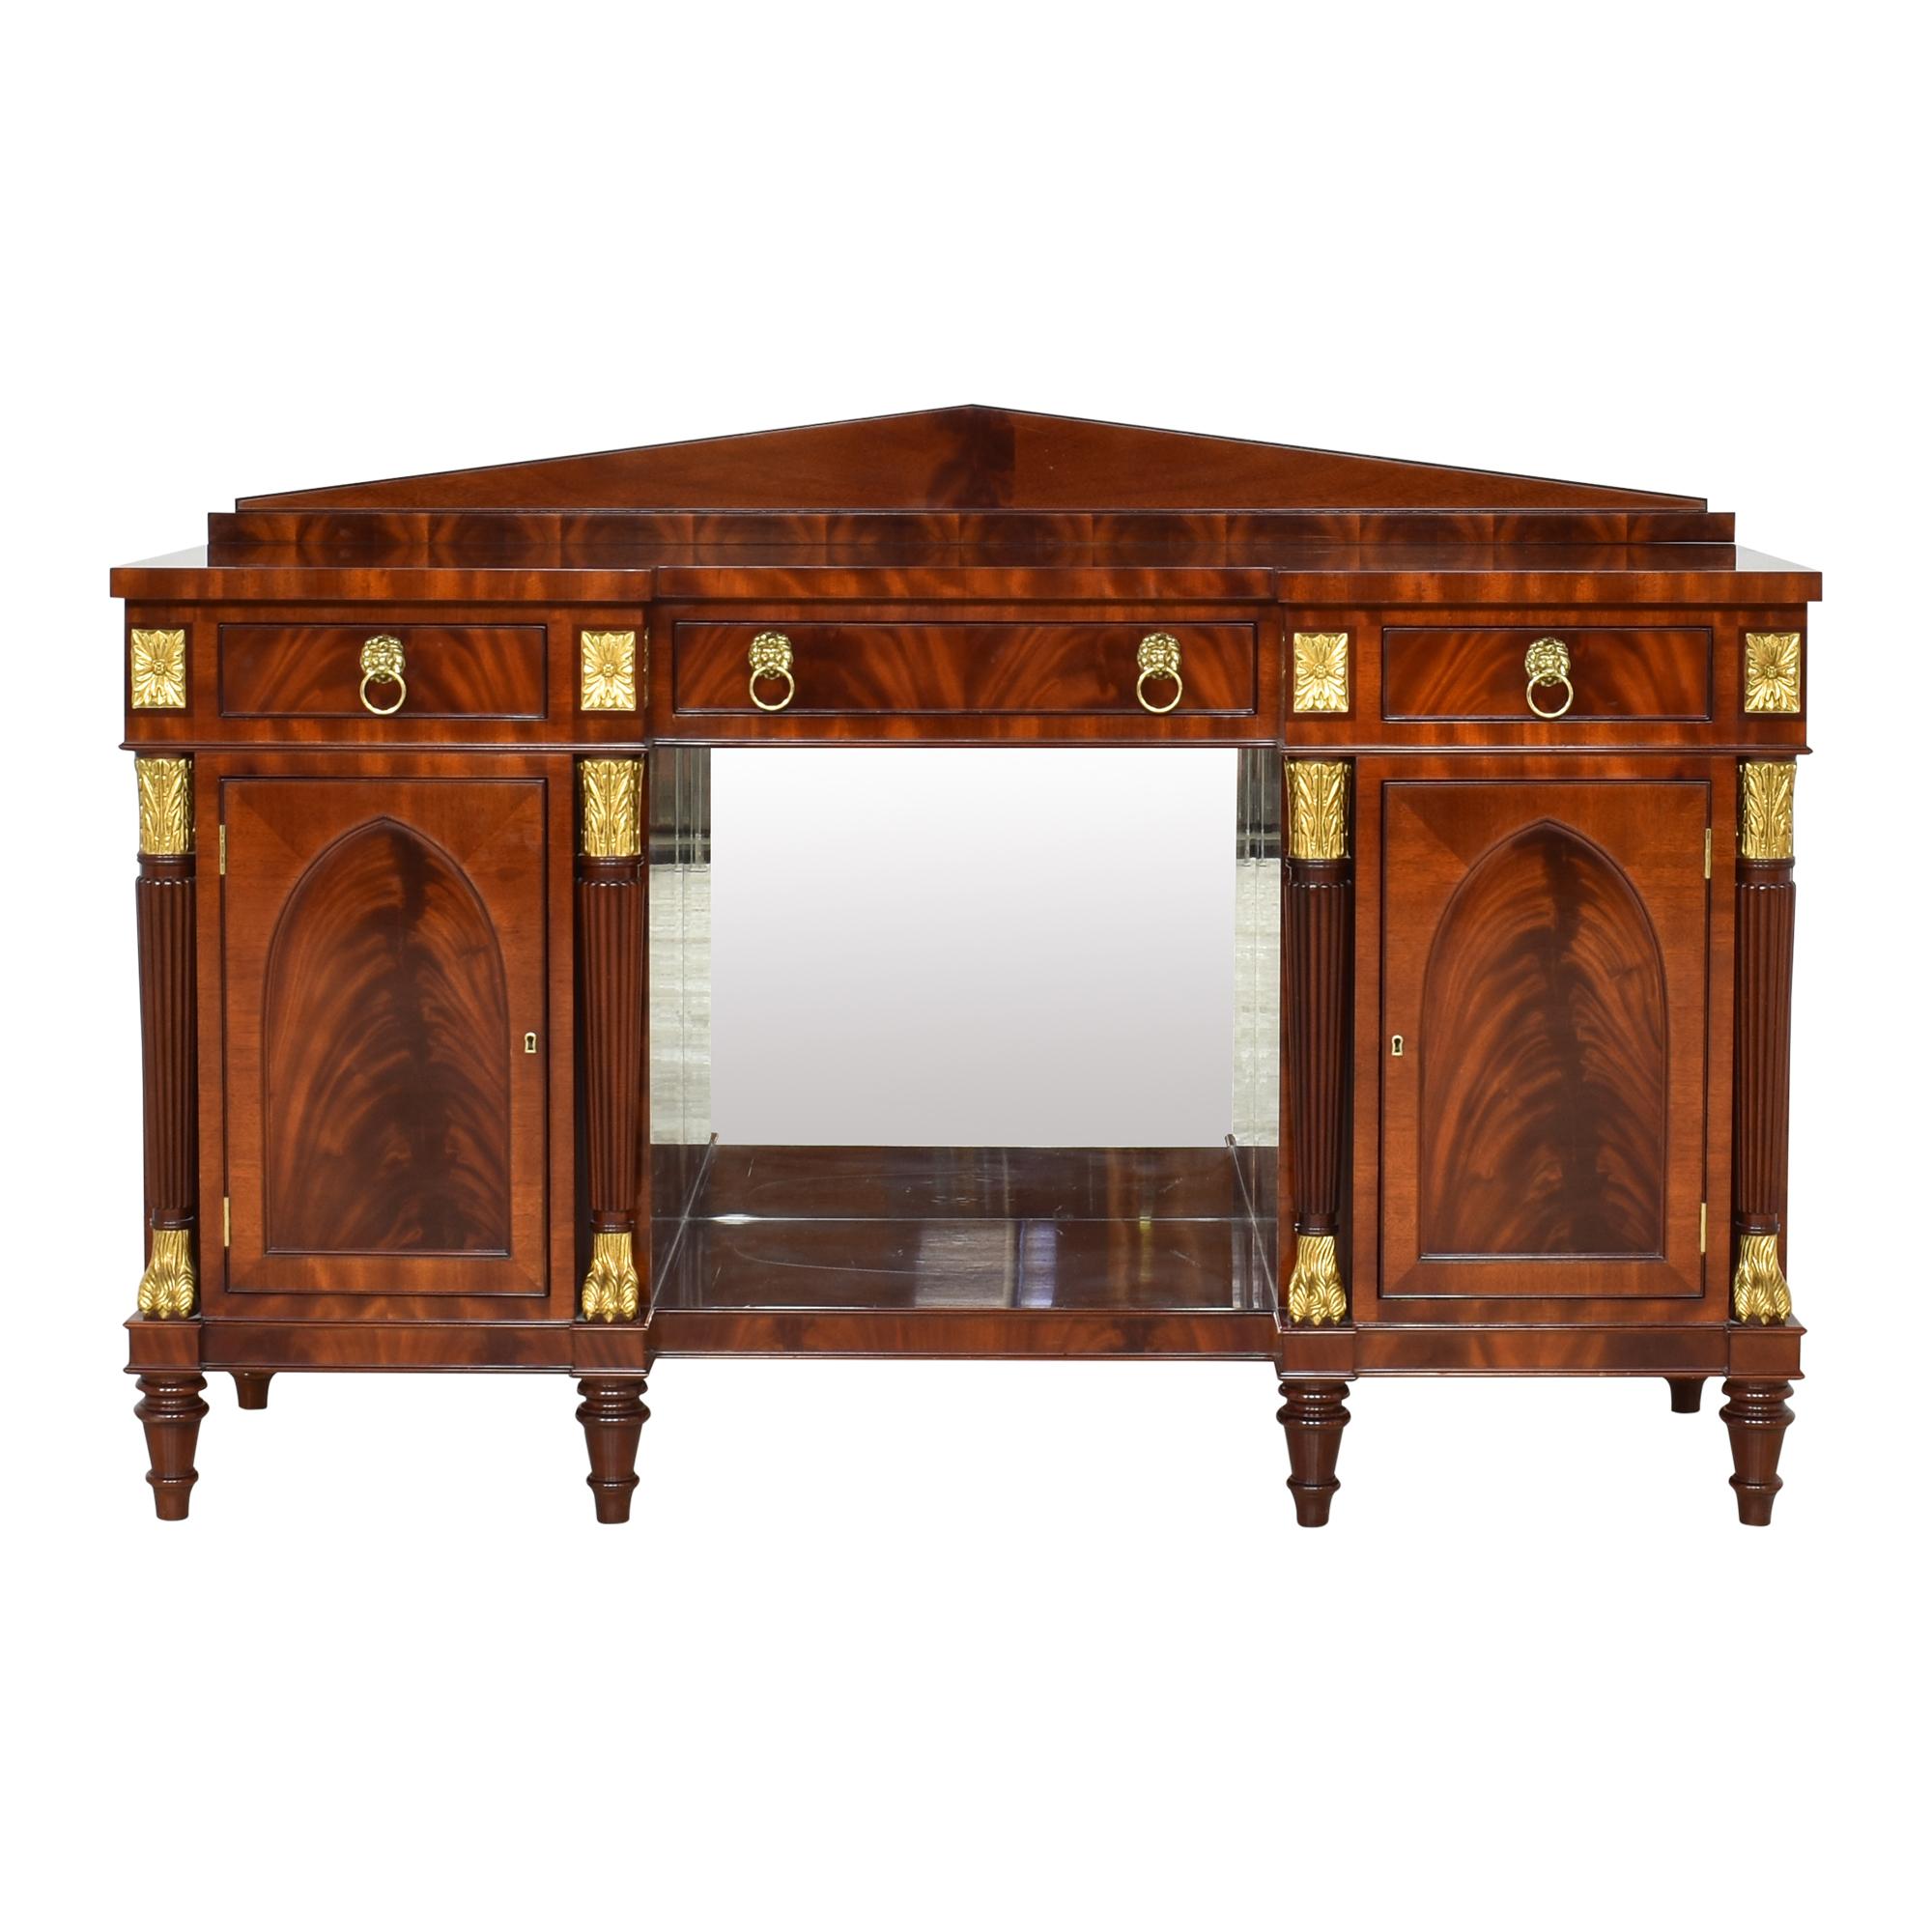 Kindel Winterthur Mirrored Sideboard / Cabinets & Sideboards